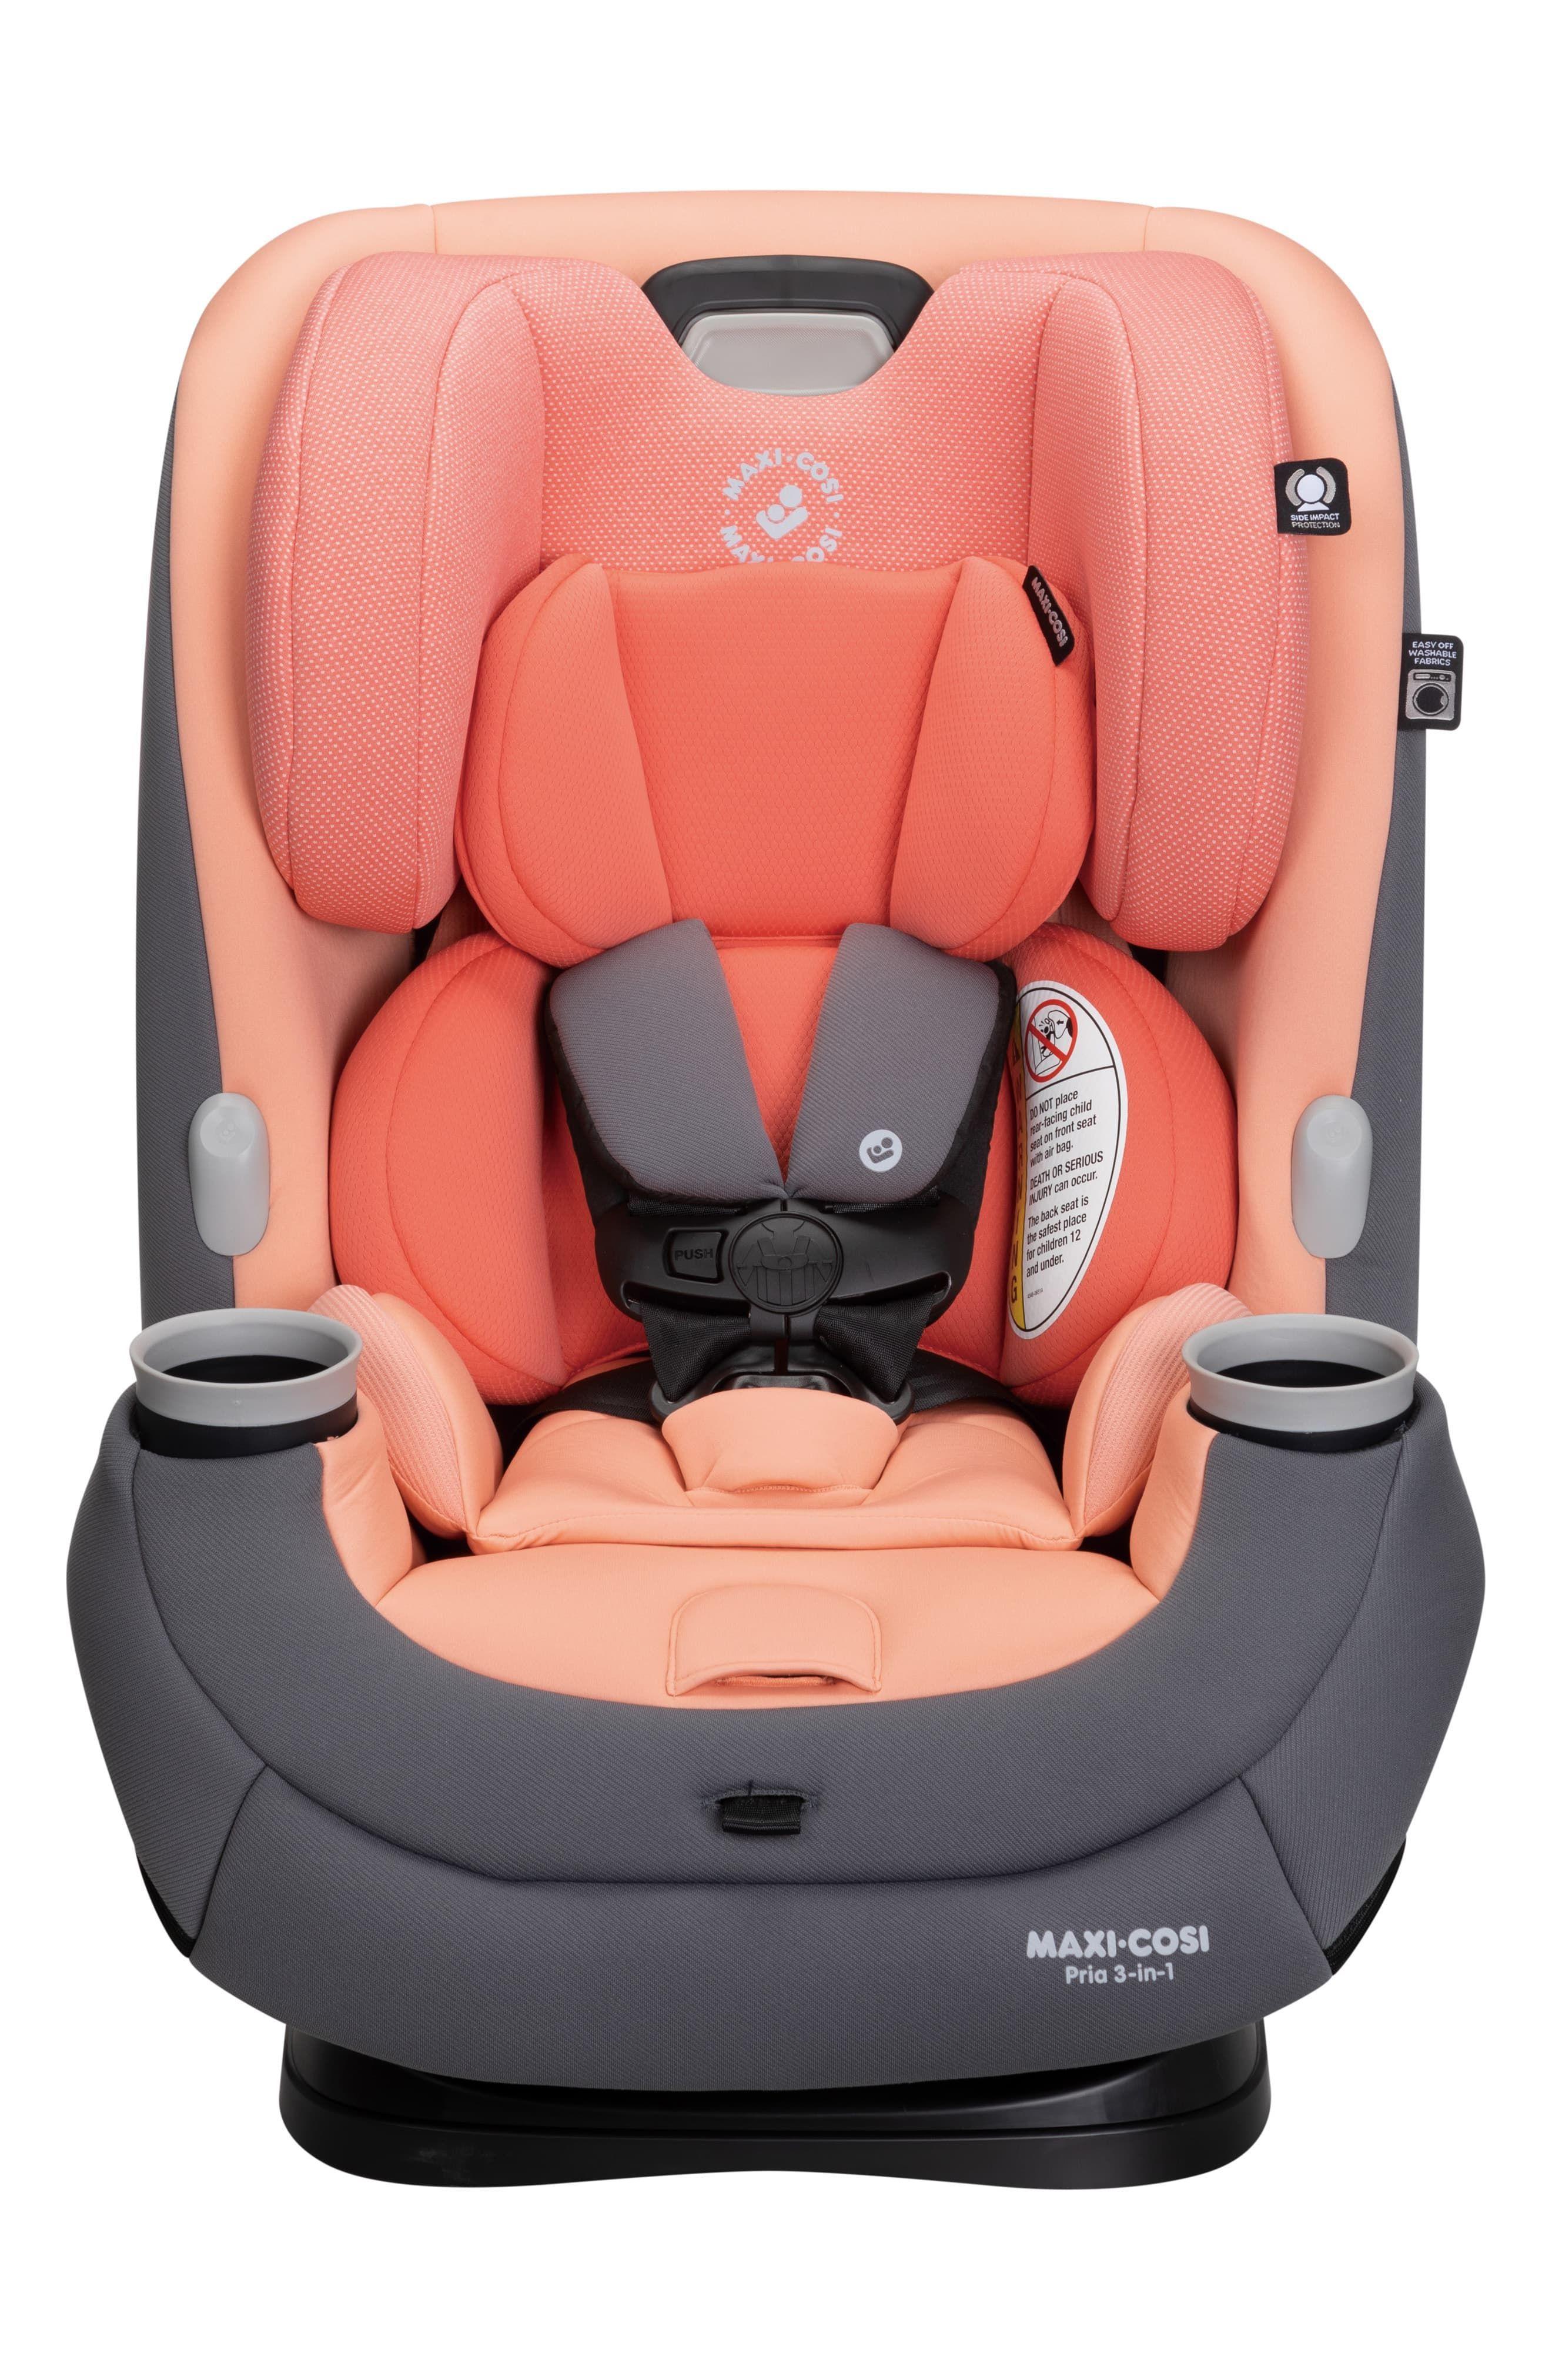 003f112a8dae5547950835d6922ba9b4 - How To Get Cover Off Maxi Cosi Car Seat